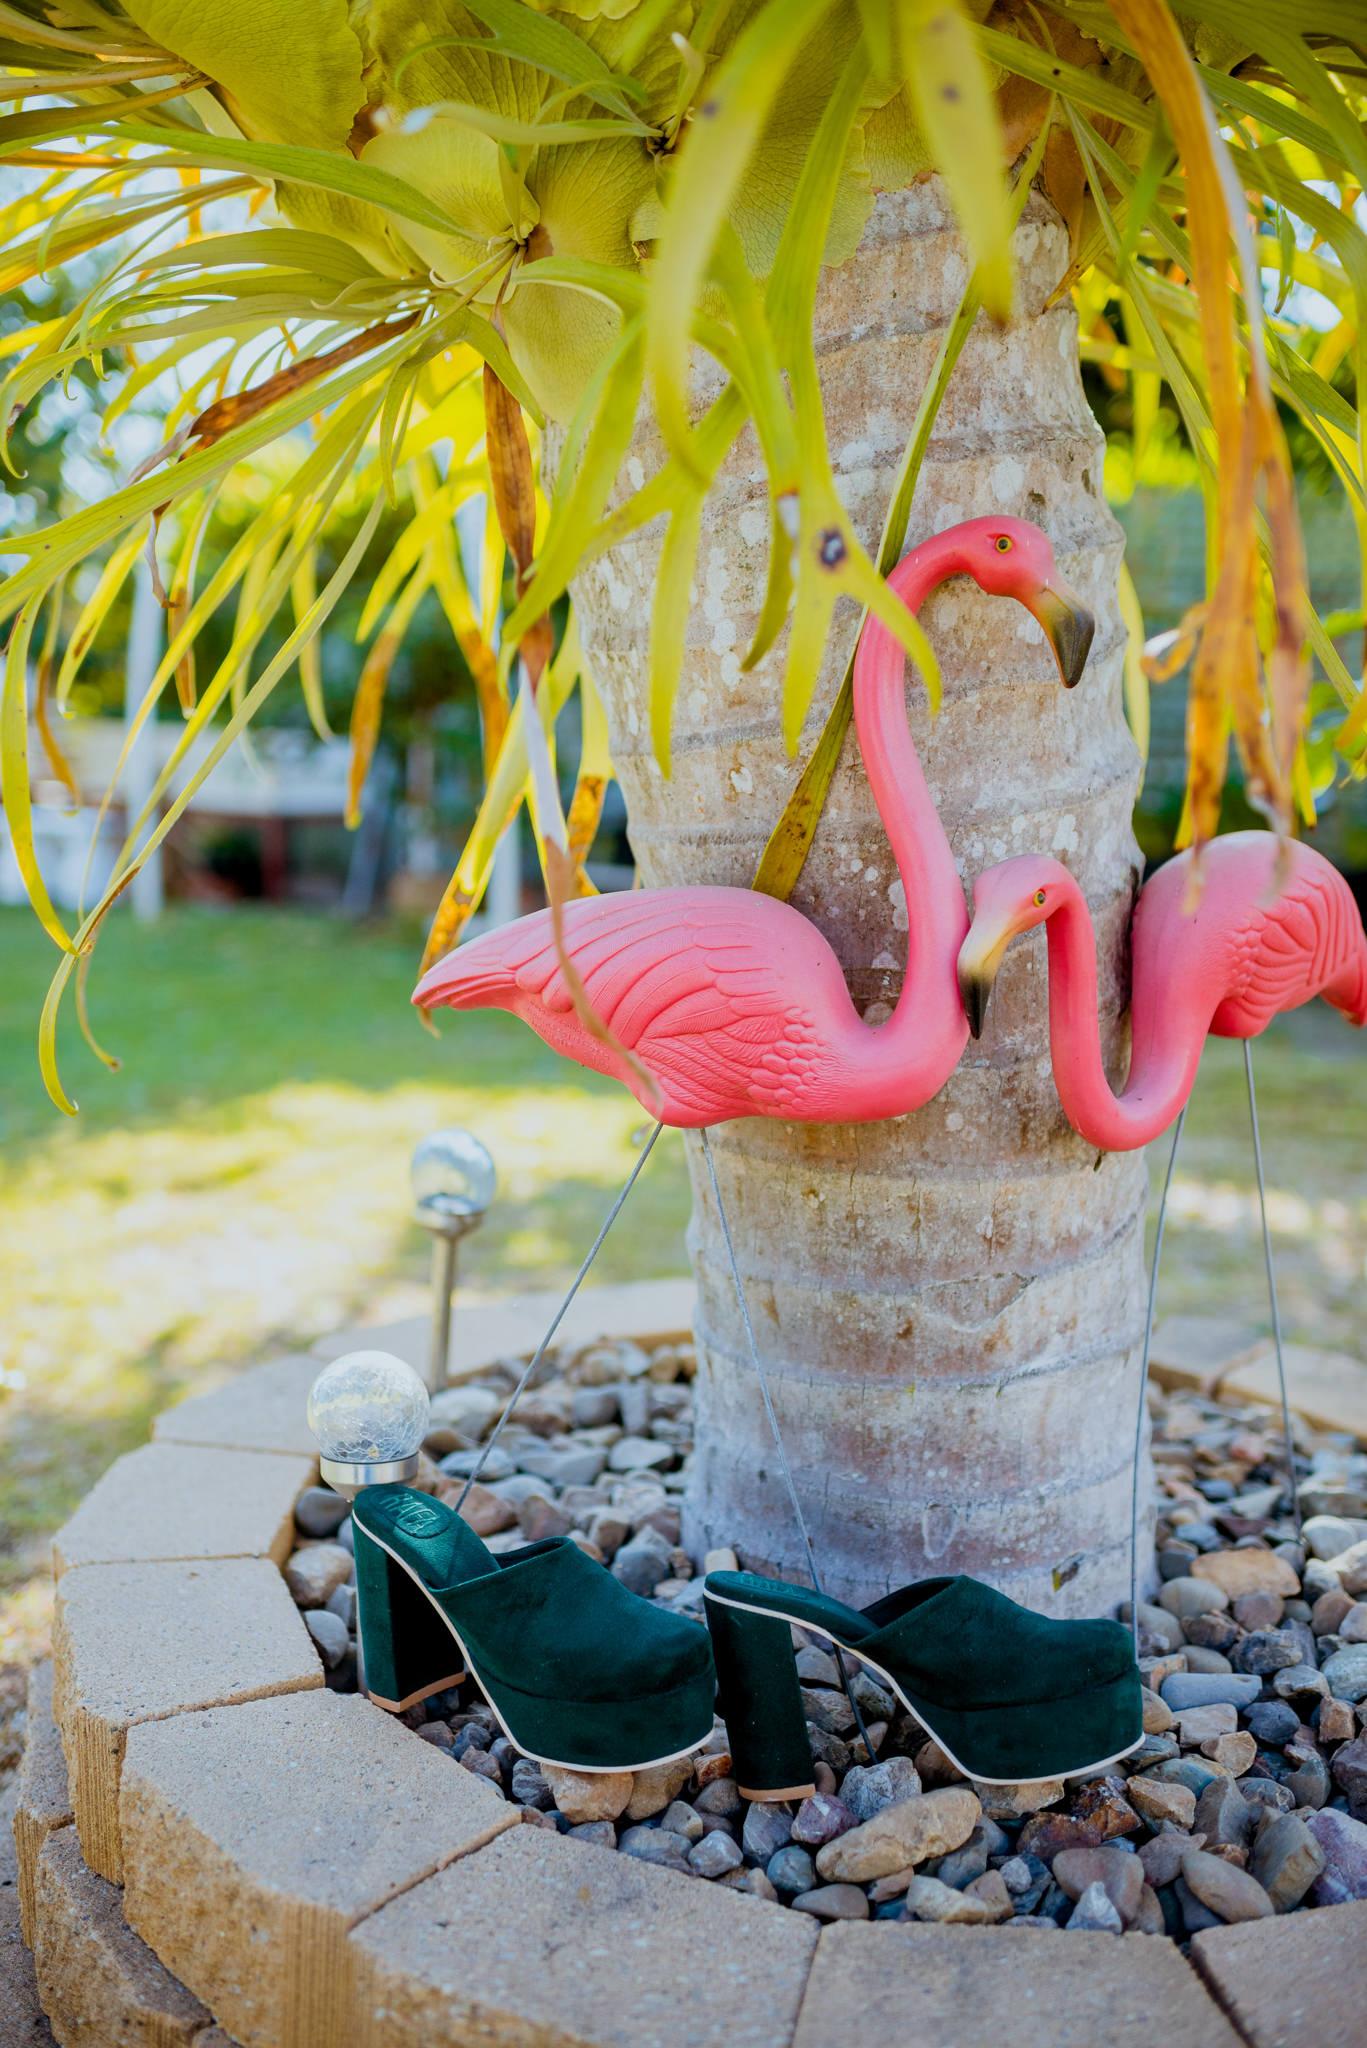 Green velvet high-heeled shoes underneath plastic flamingos under a palm tree